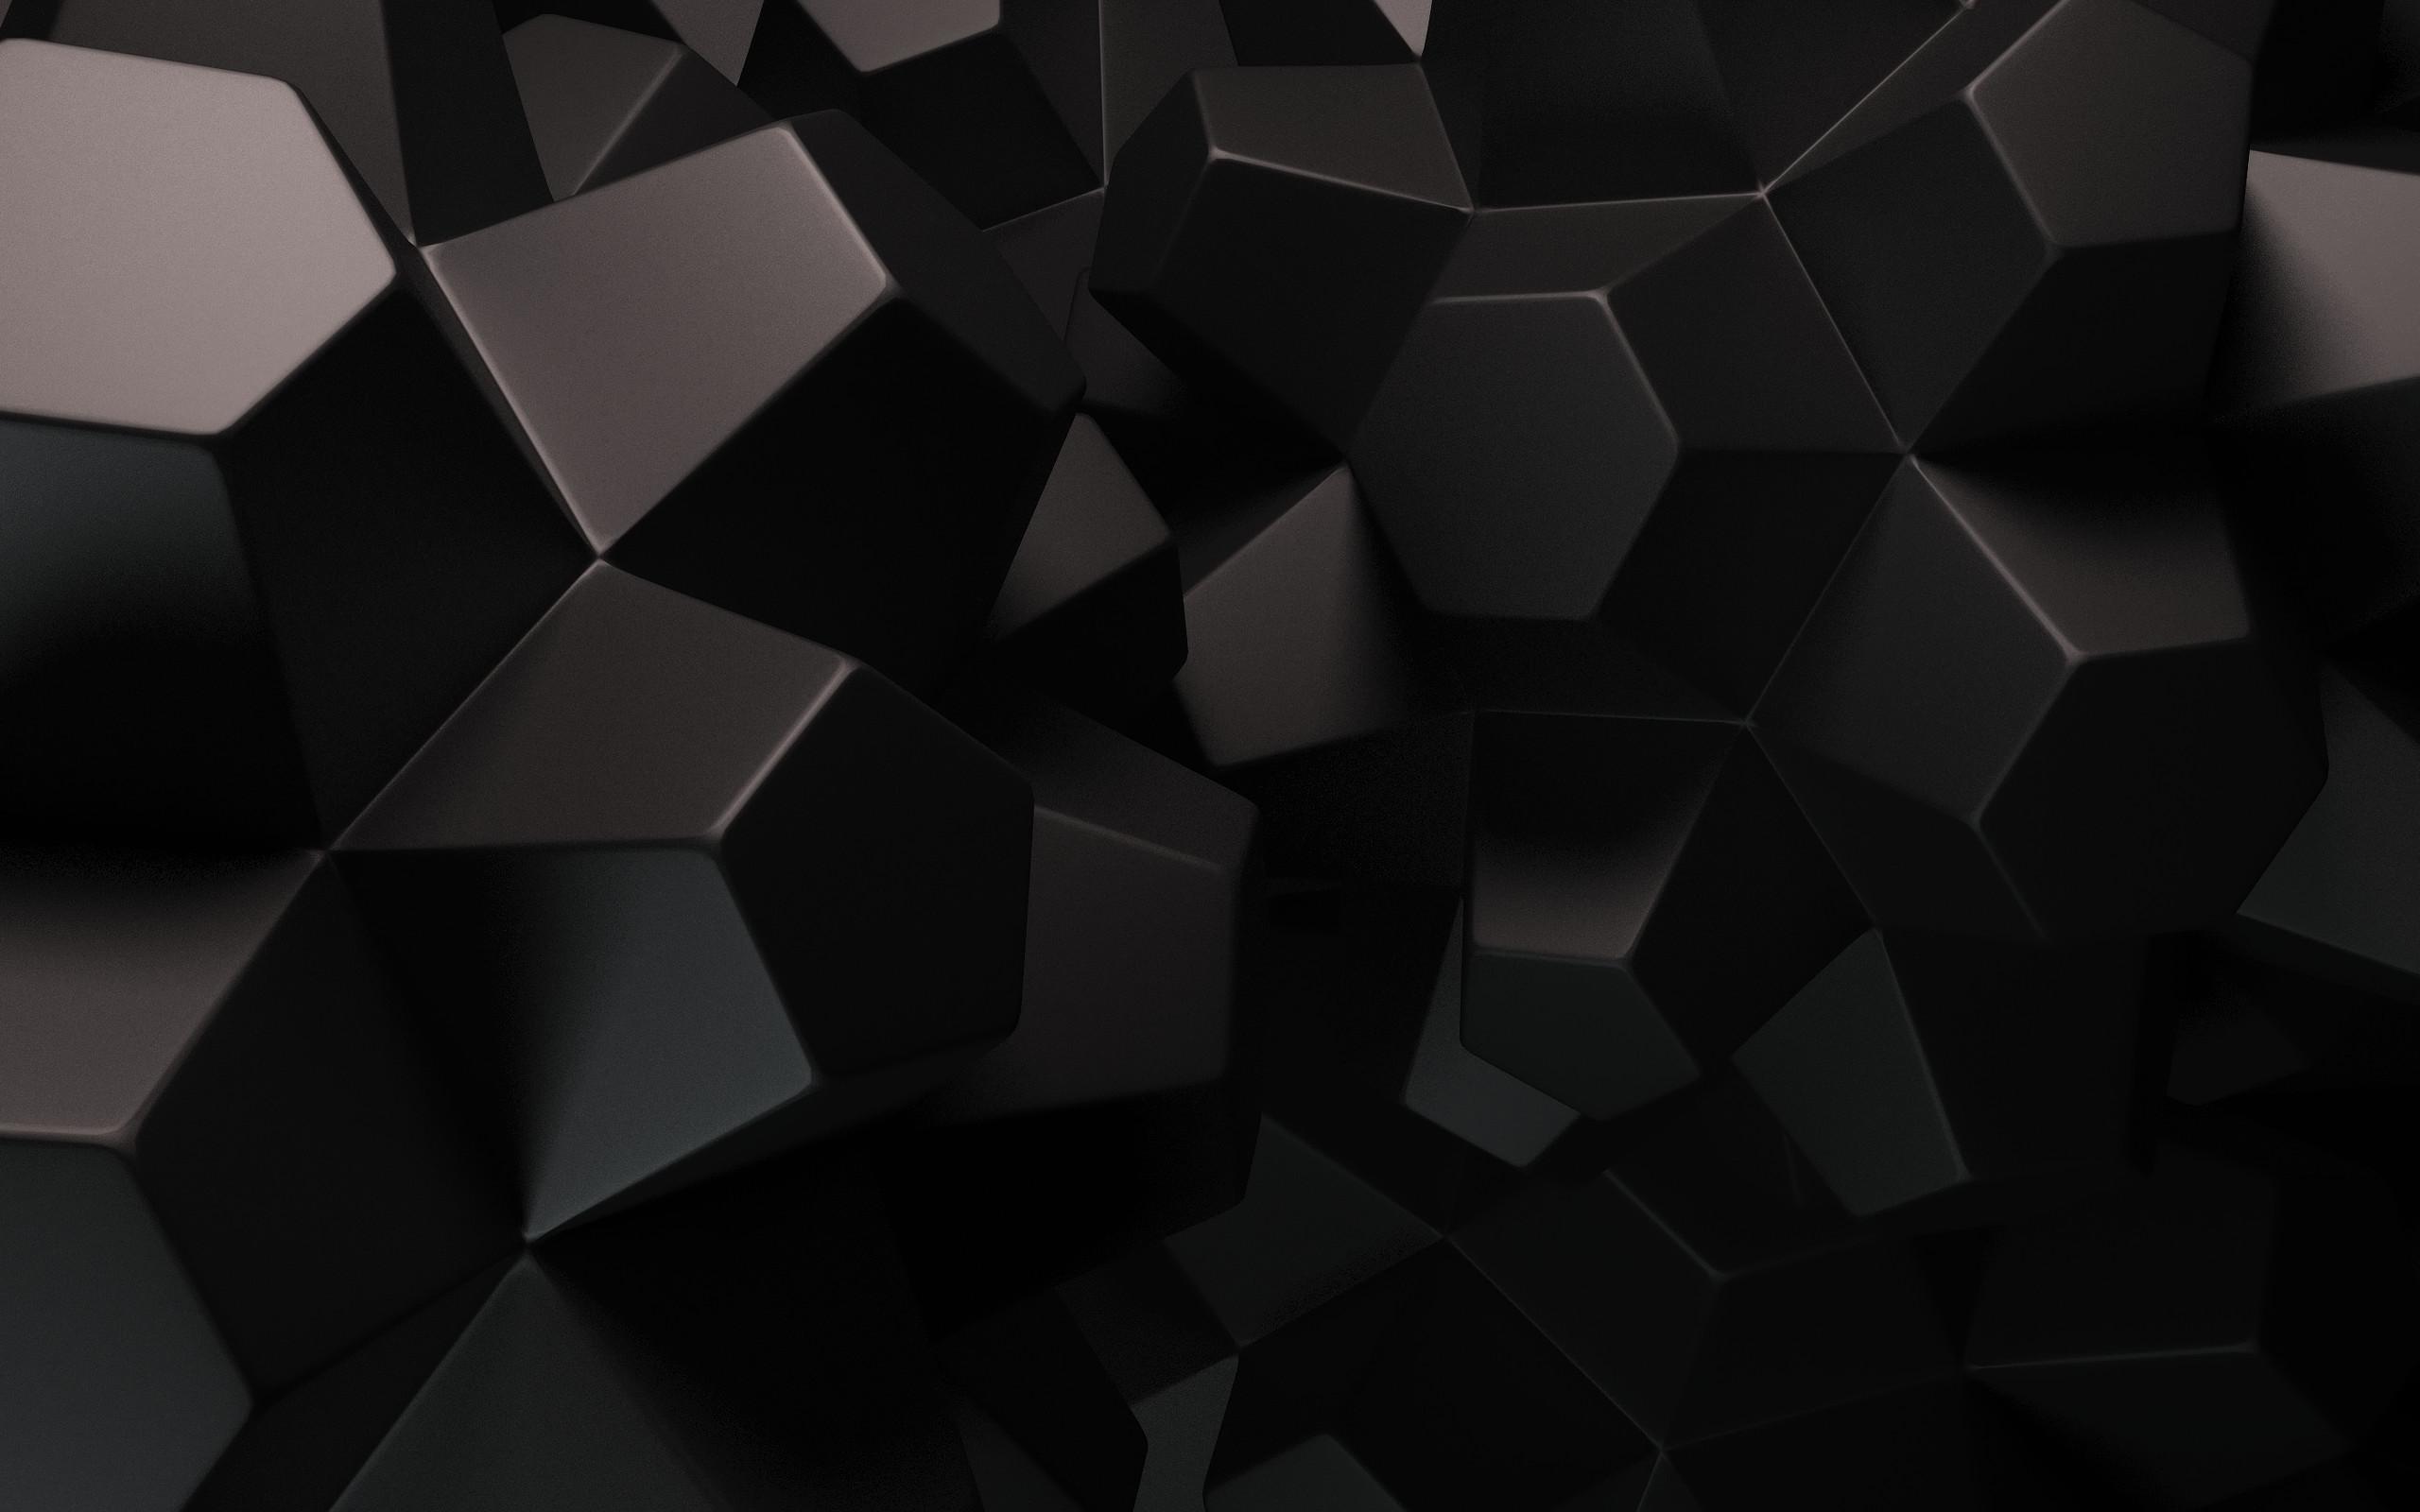 Geometric shapes HD Wallpaper 1920×1080 Geometric shapes HD Wallpaper